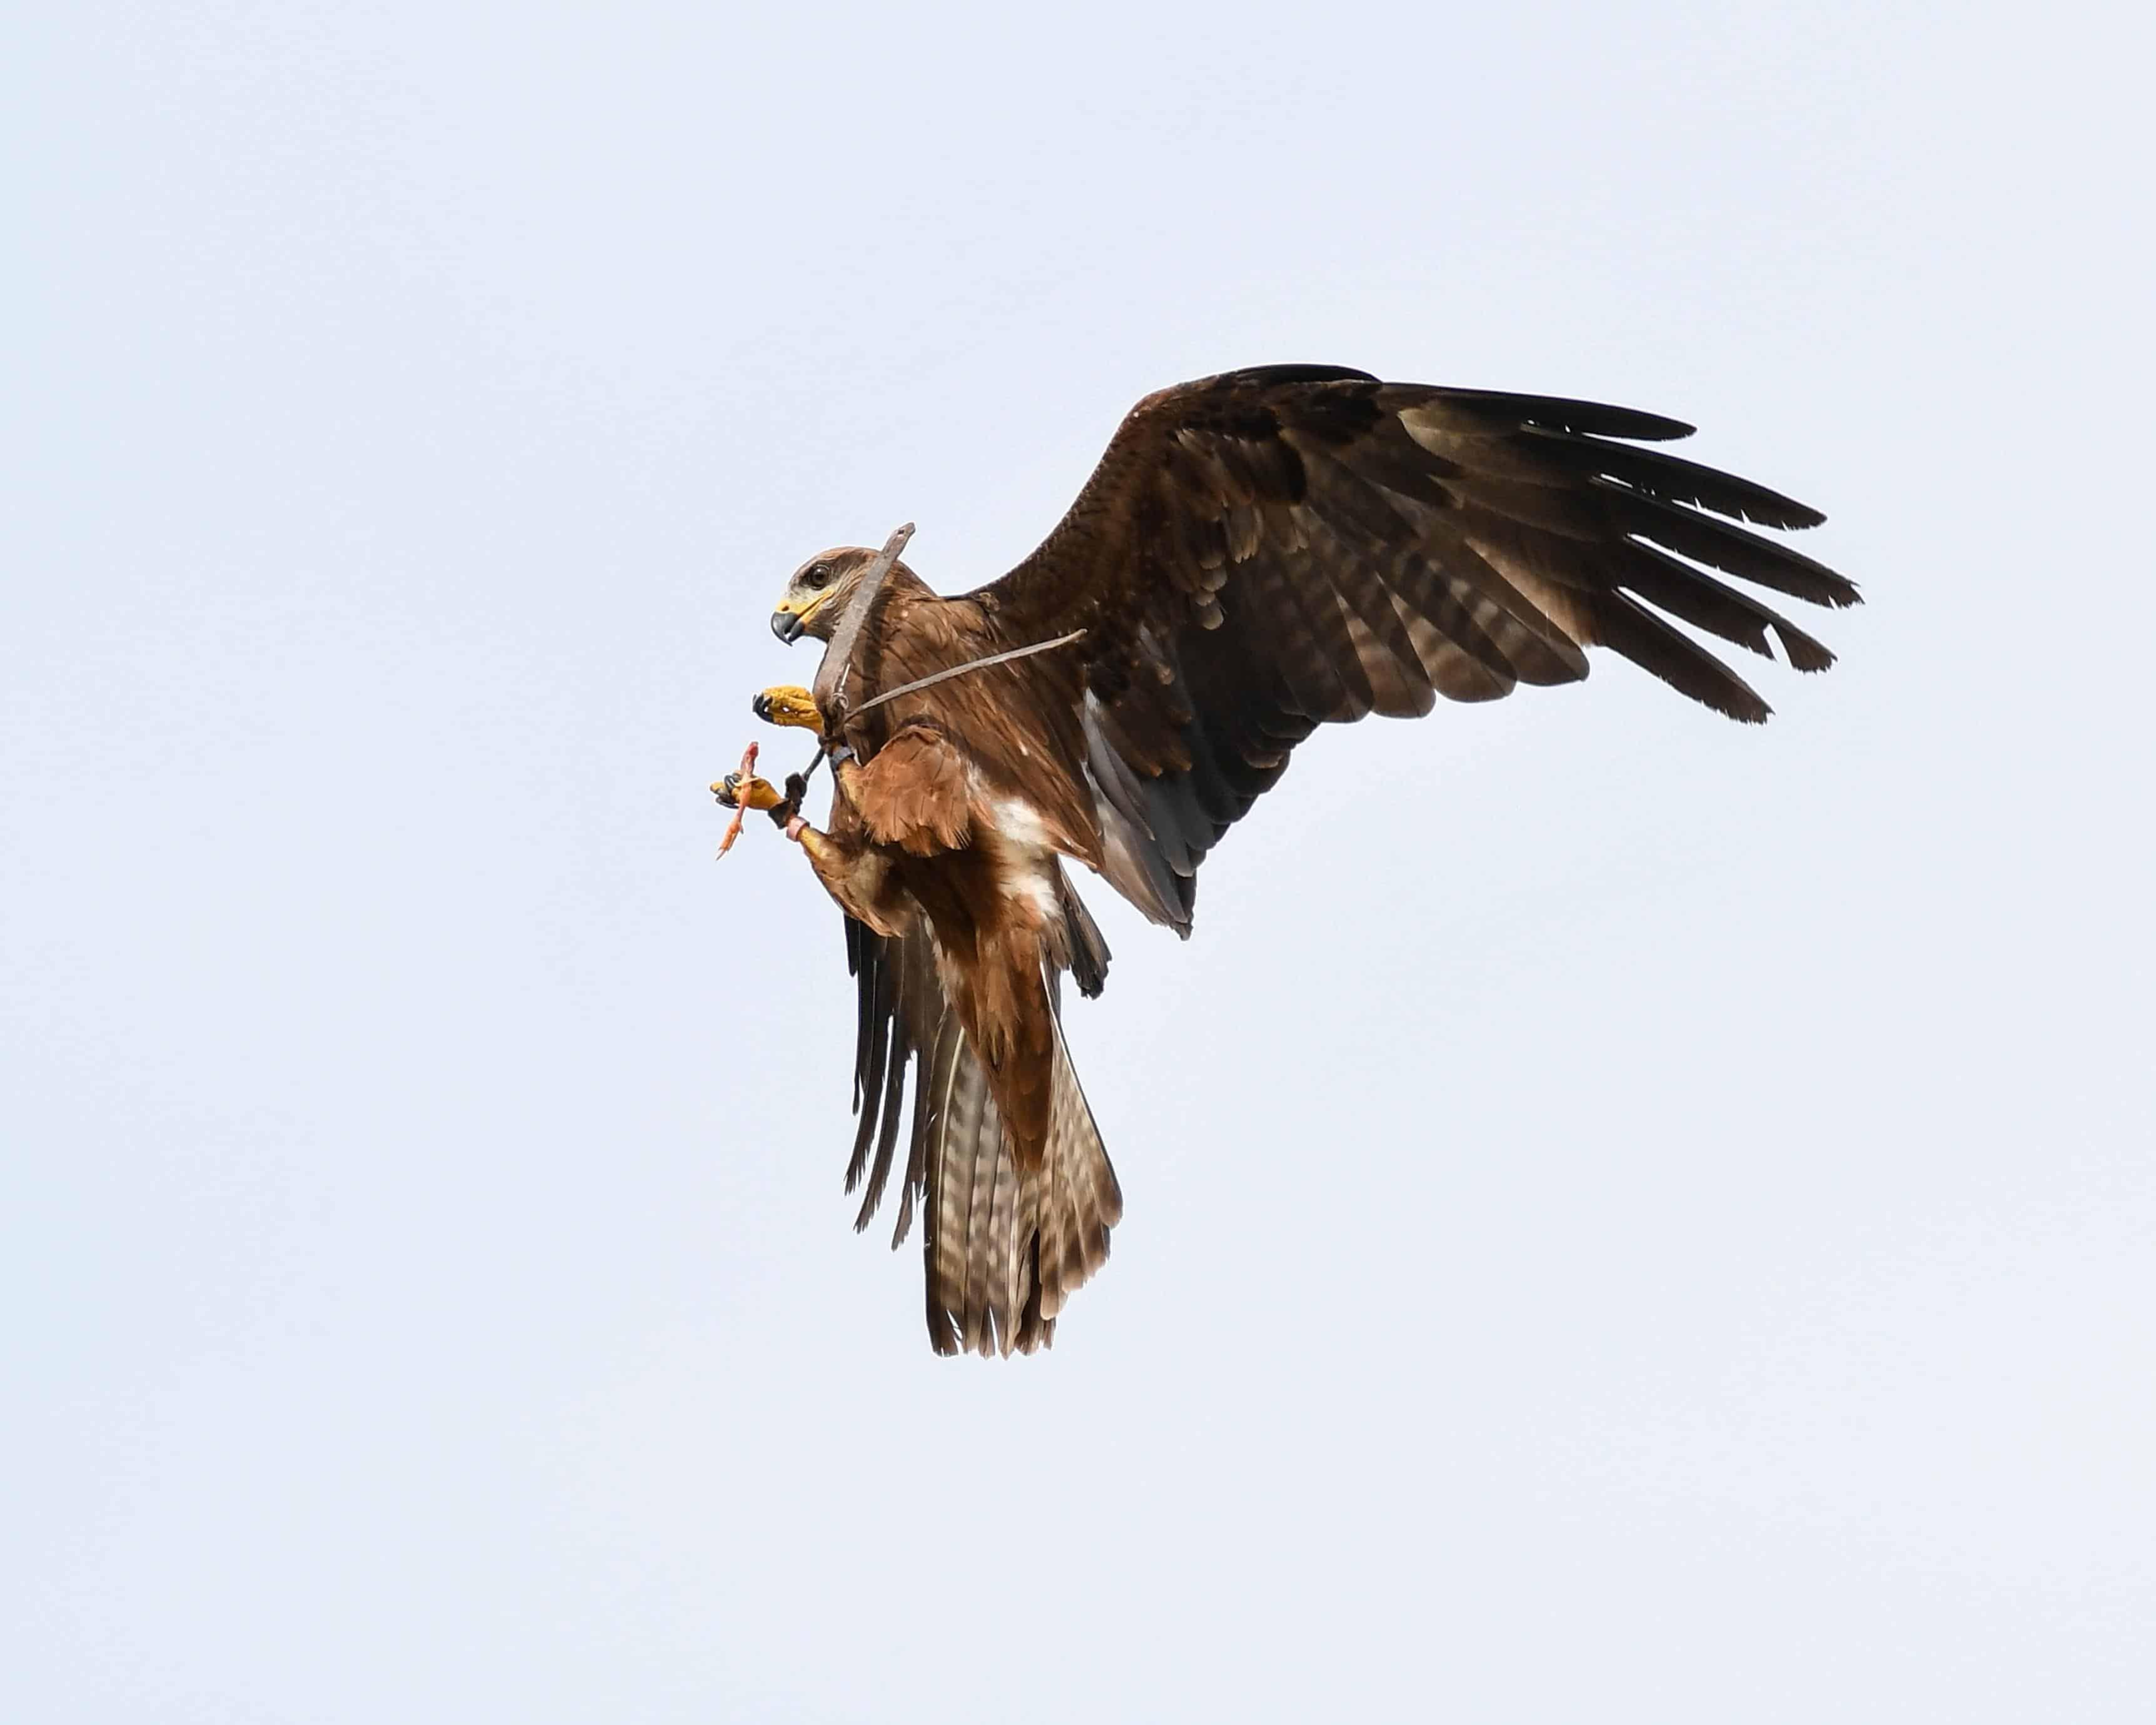 imagem gratuita animal bico pássaro céu animais selvagens aves